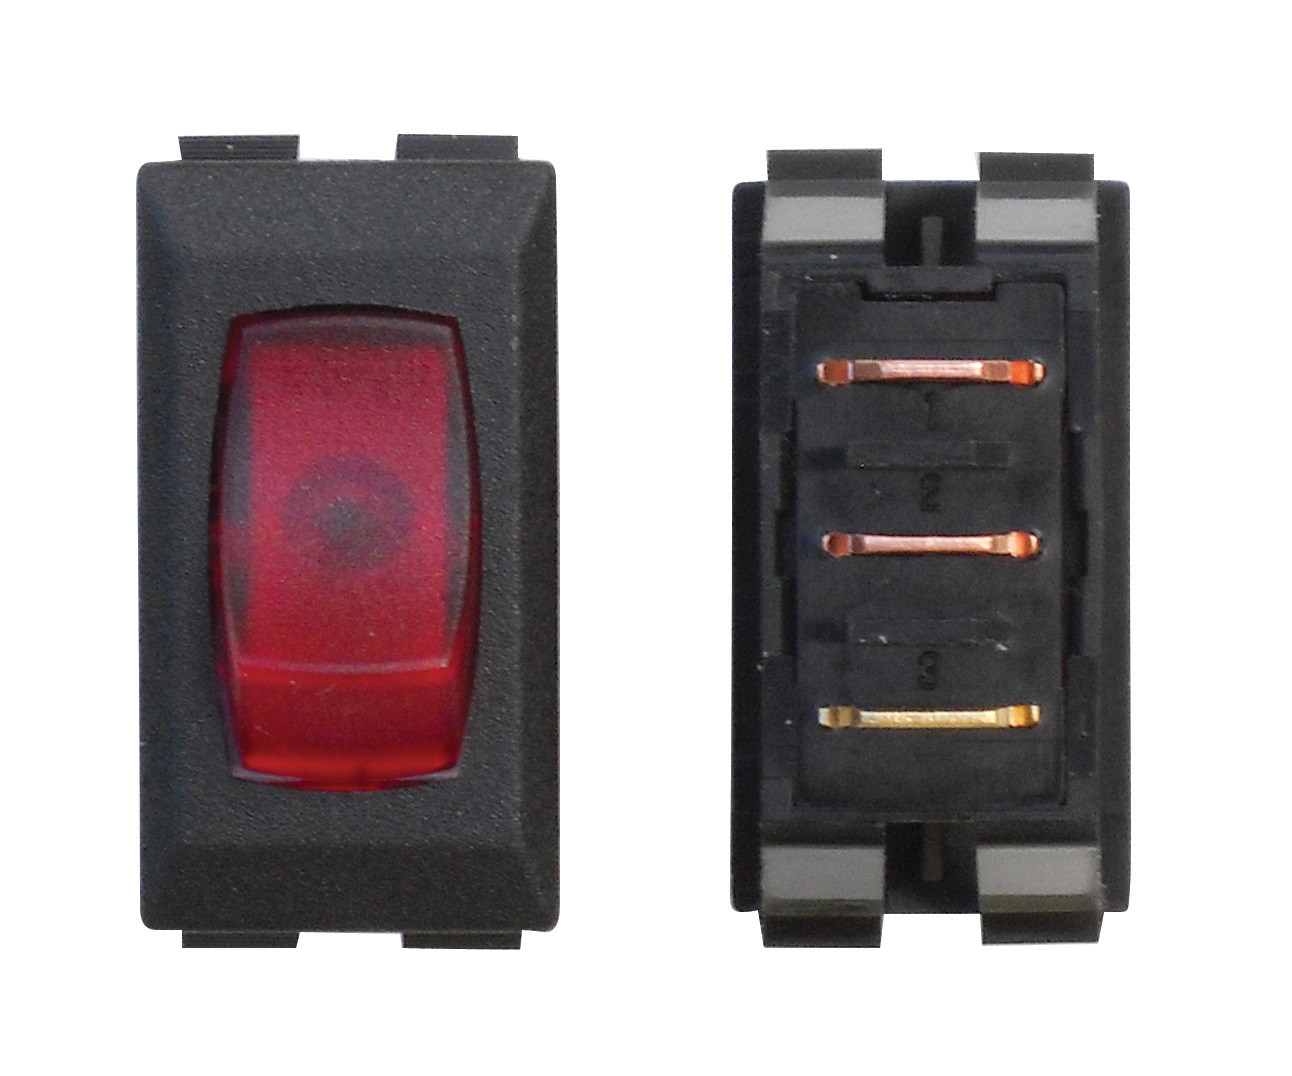 Illuminated On/Off 110V Switch - Red/Black 3/bag